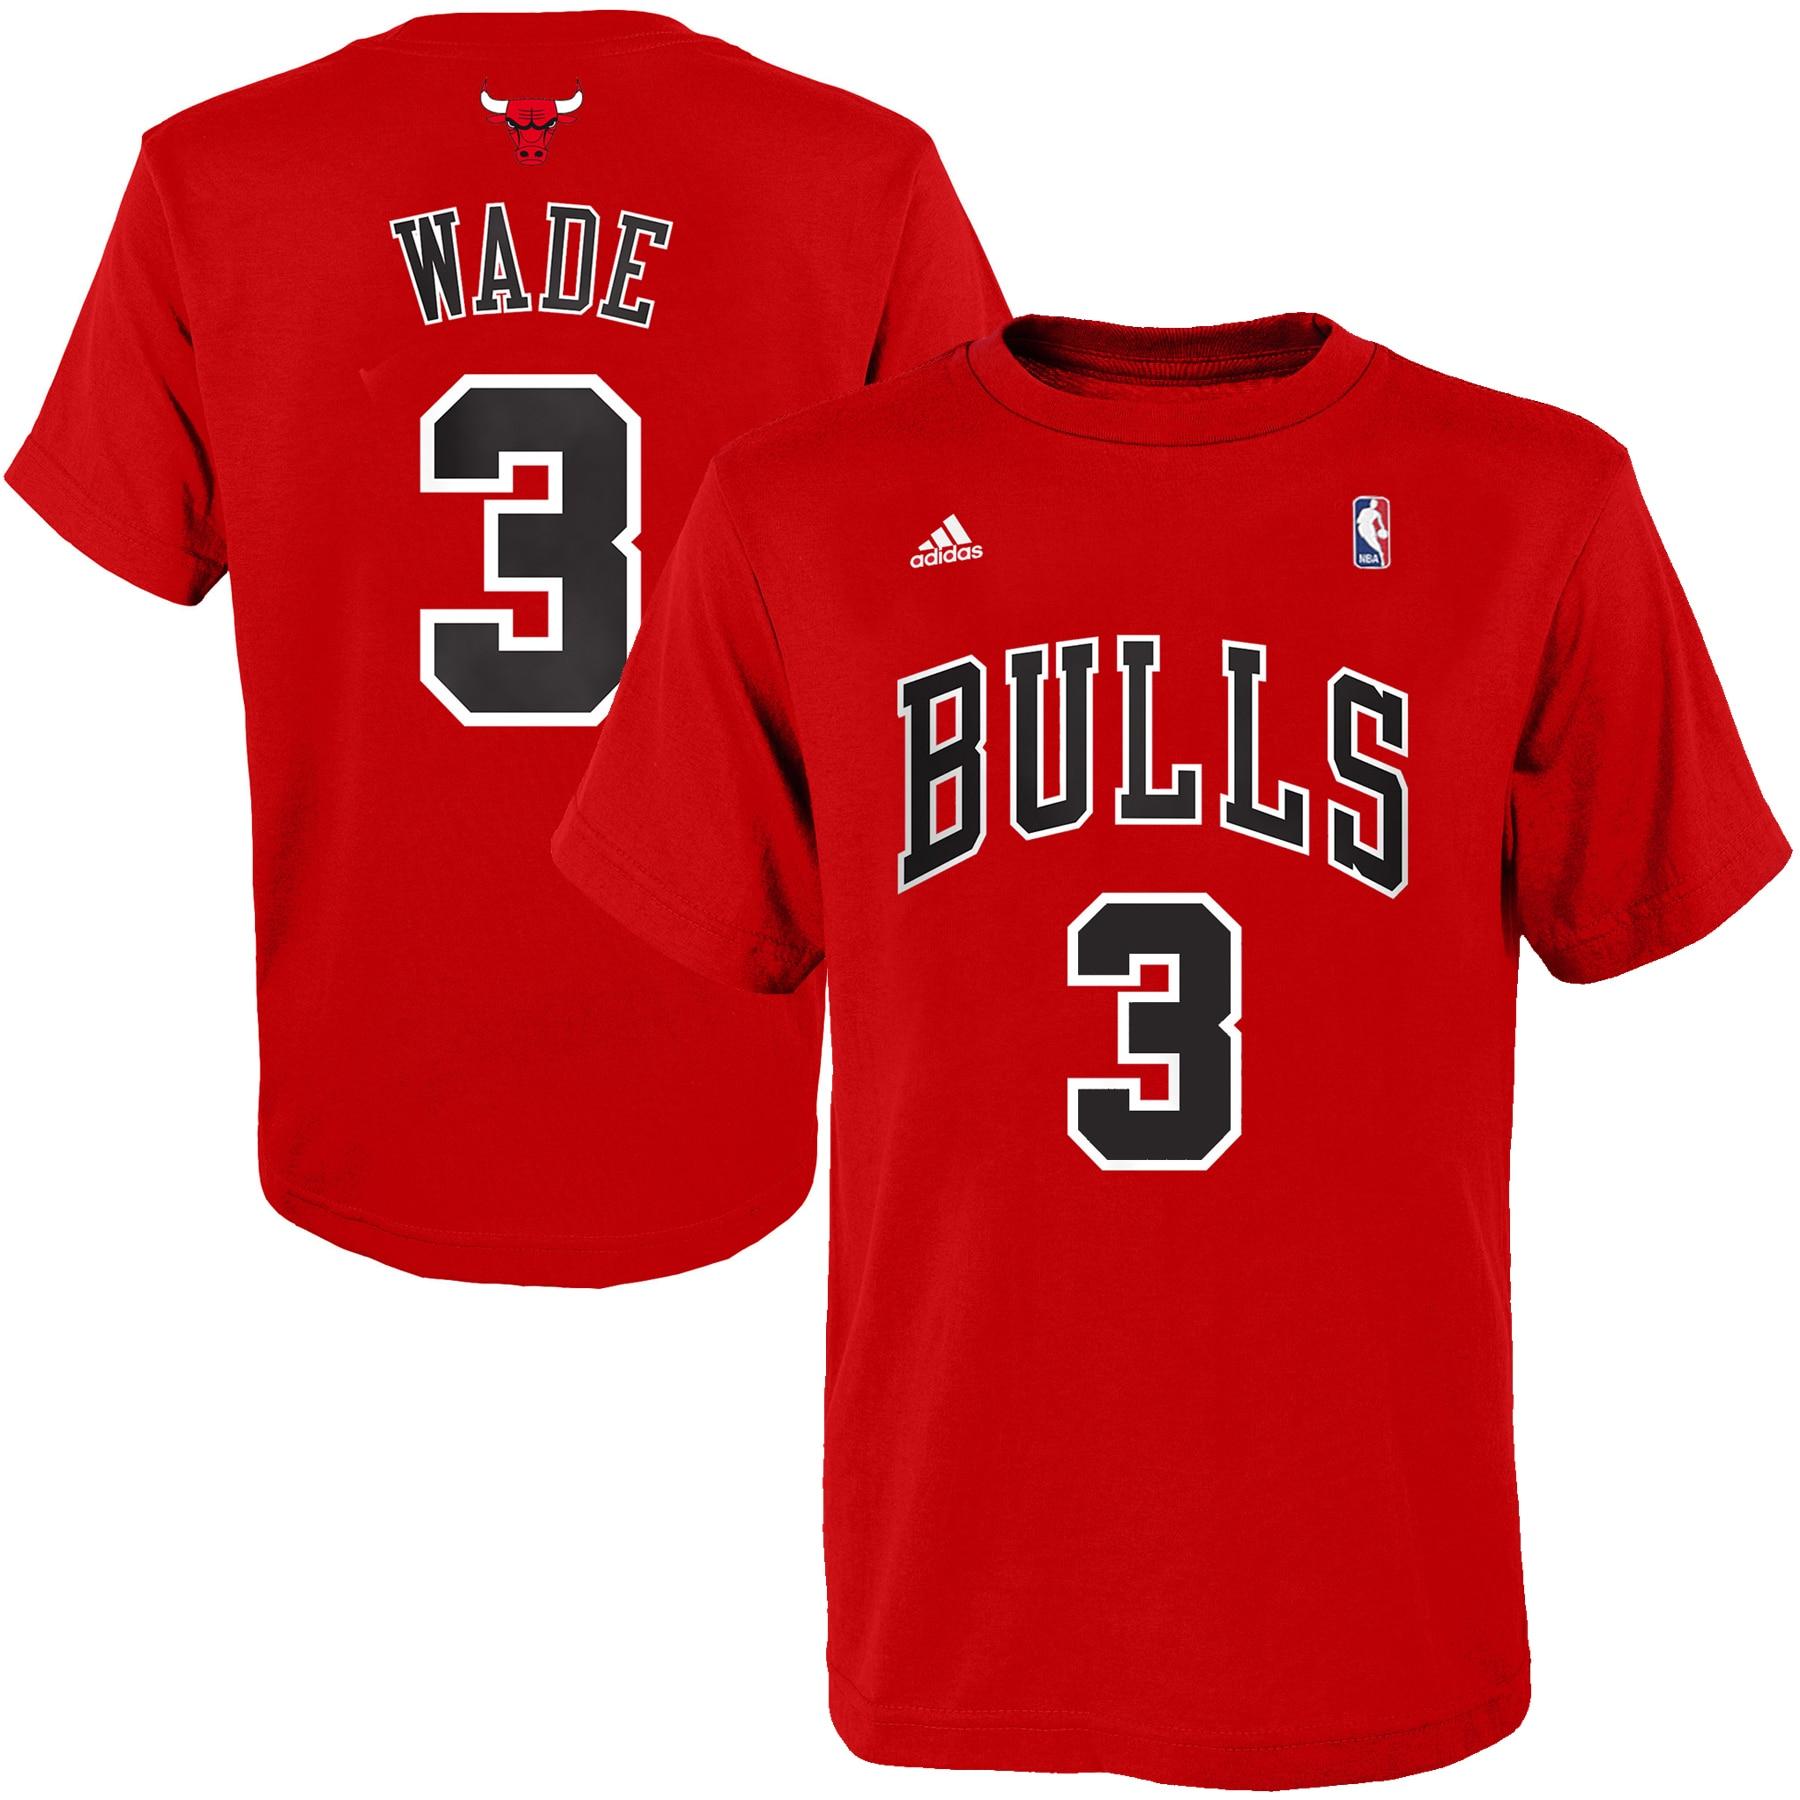 Dwyane Wade Chicago Bulls adidas Youth Game Time Name & Number T-Shirt - Red